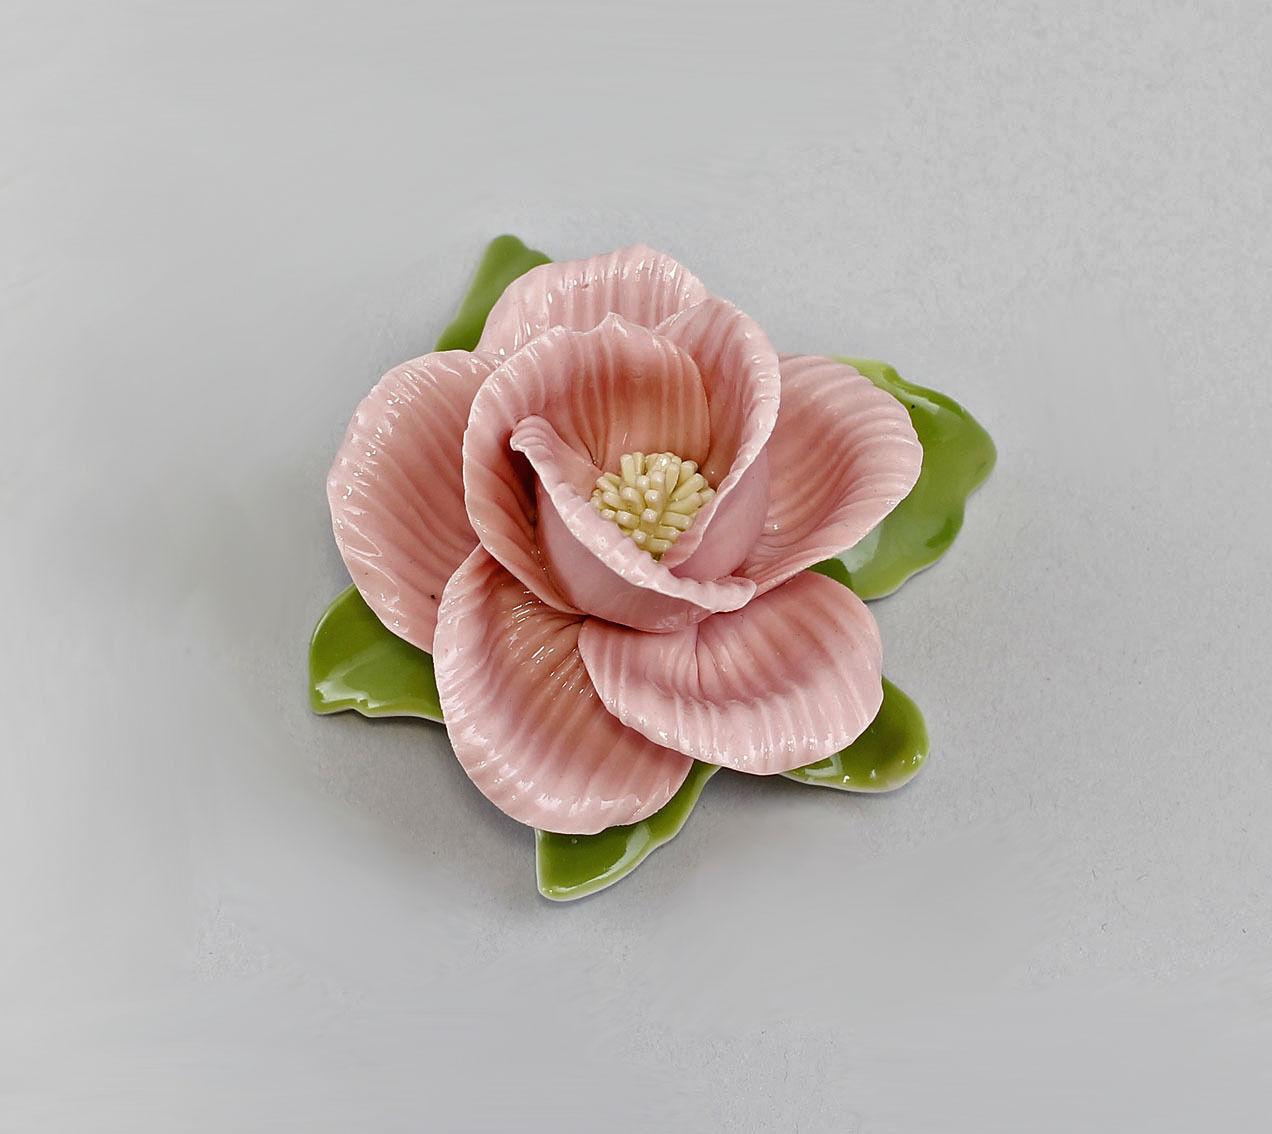 handmade  Table Rose Wild Rose Kämmer-Porcelain H4CM a3-44130